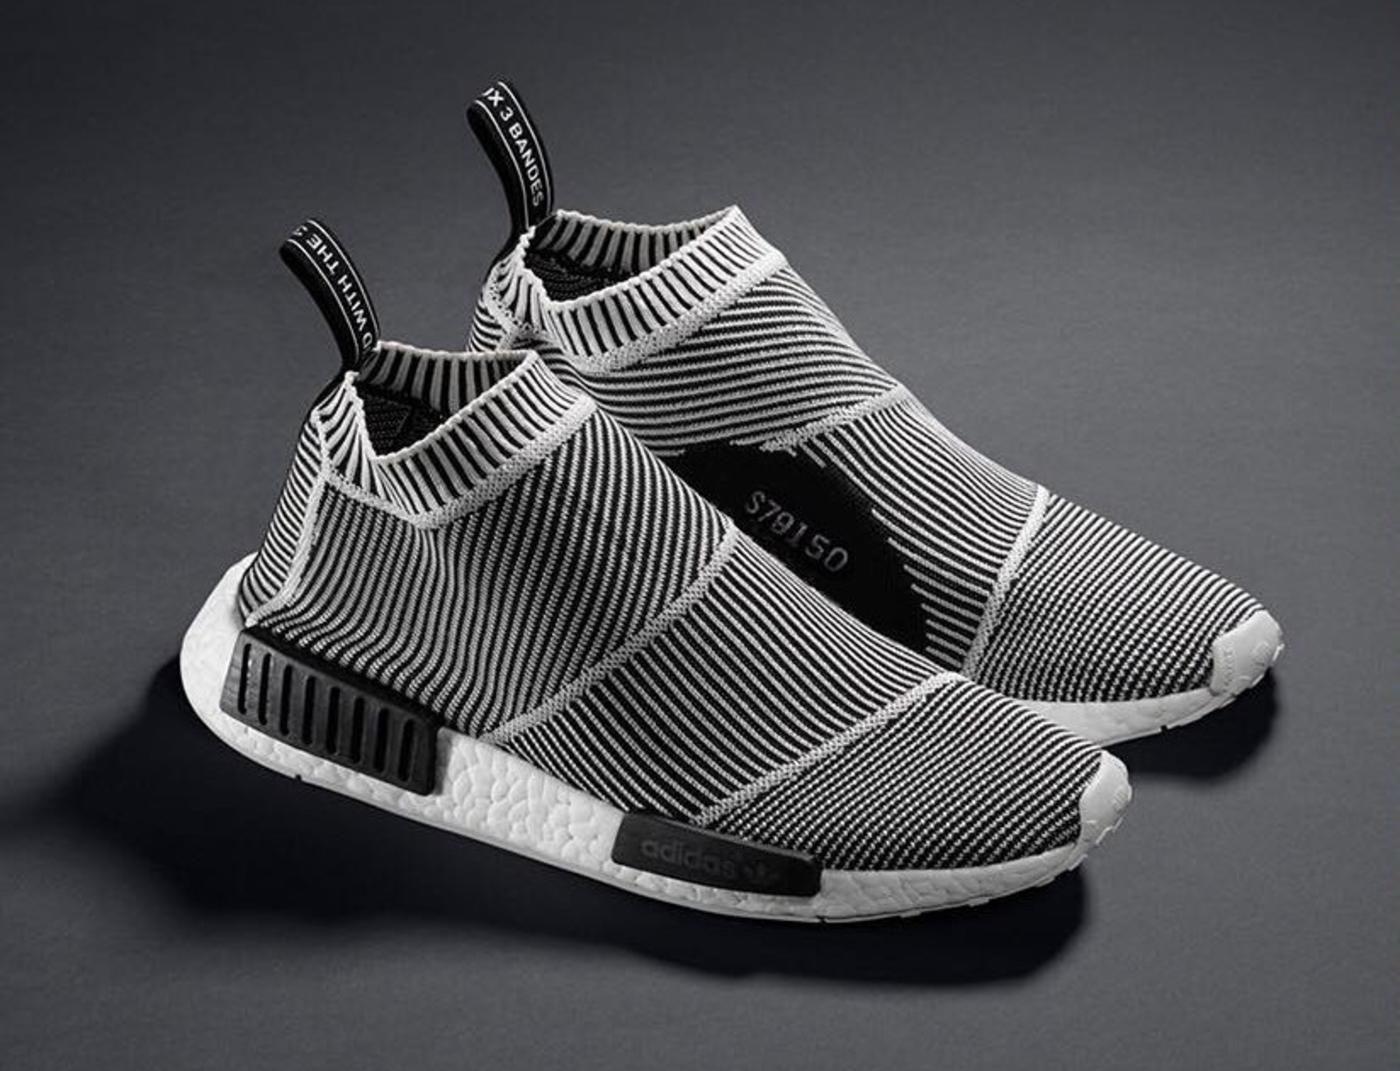 adidas Originals Announces Release Details for the NMD City Sock